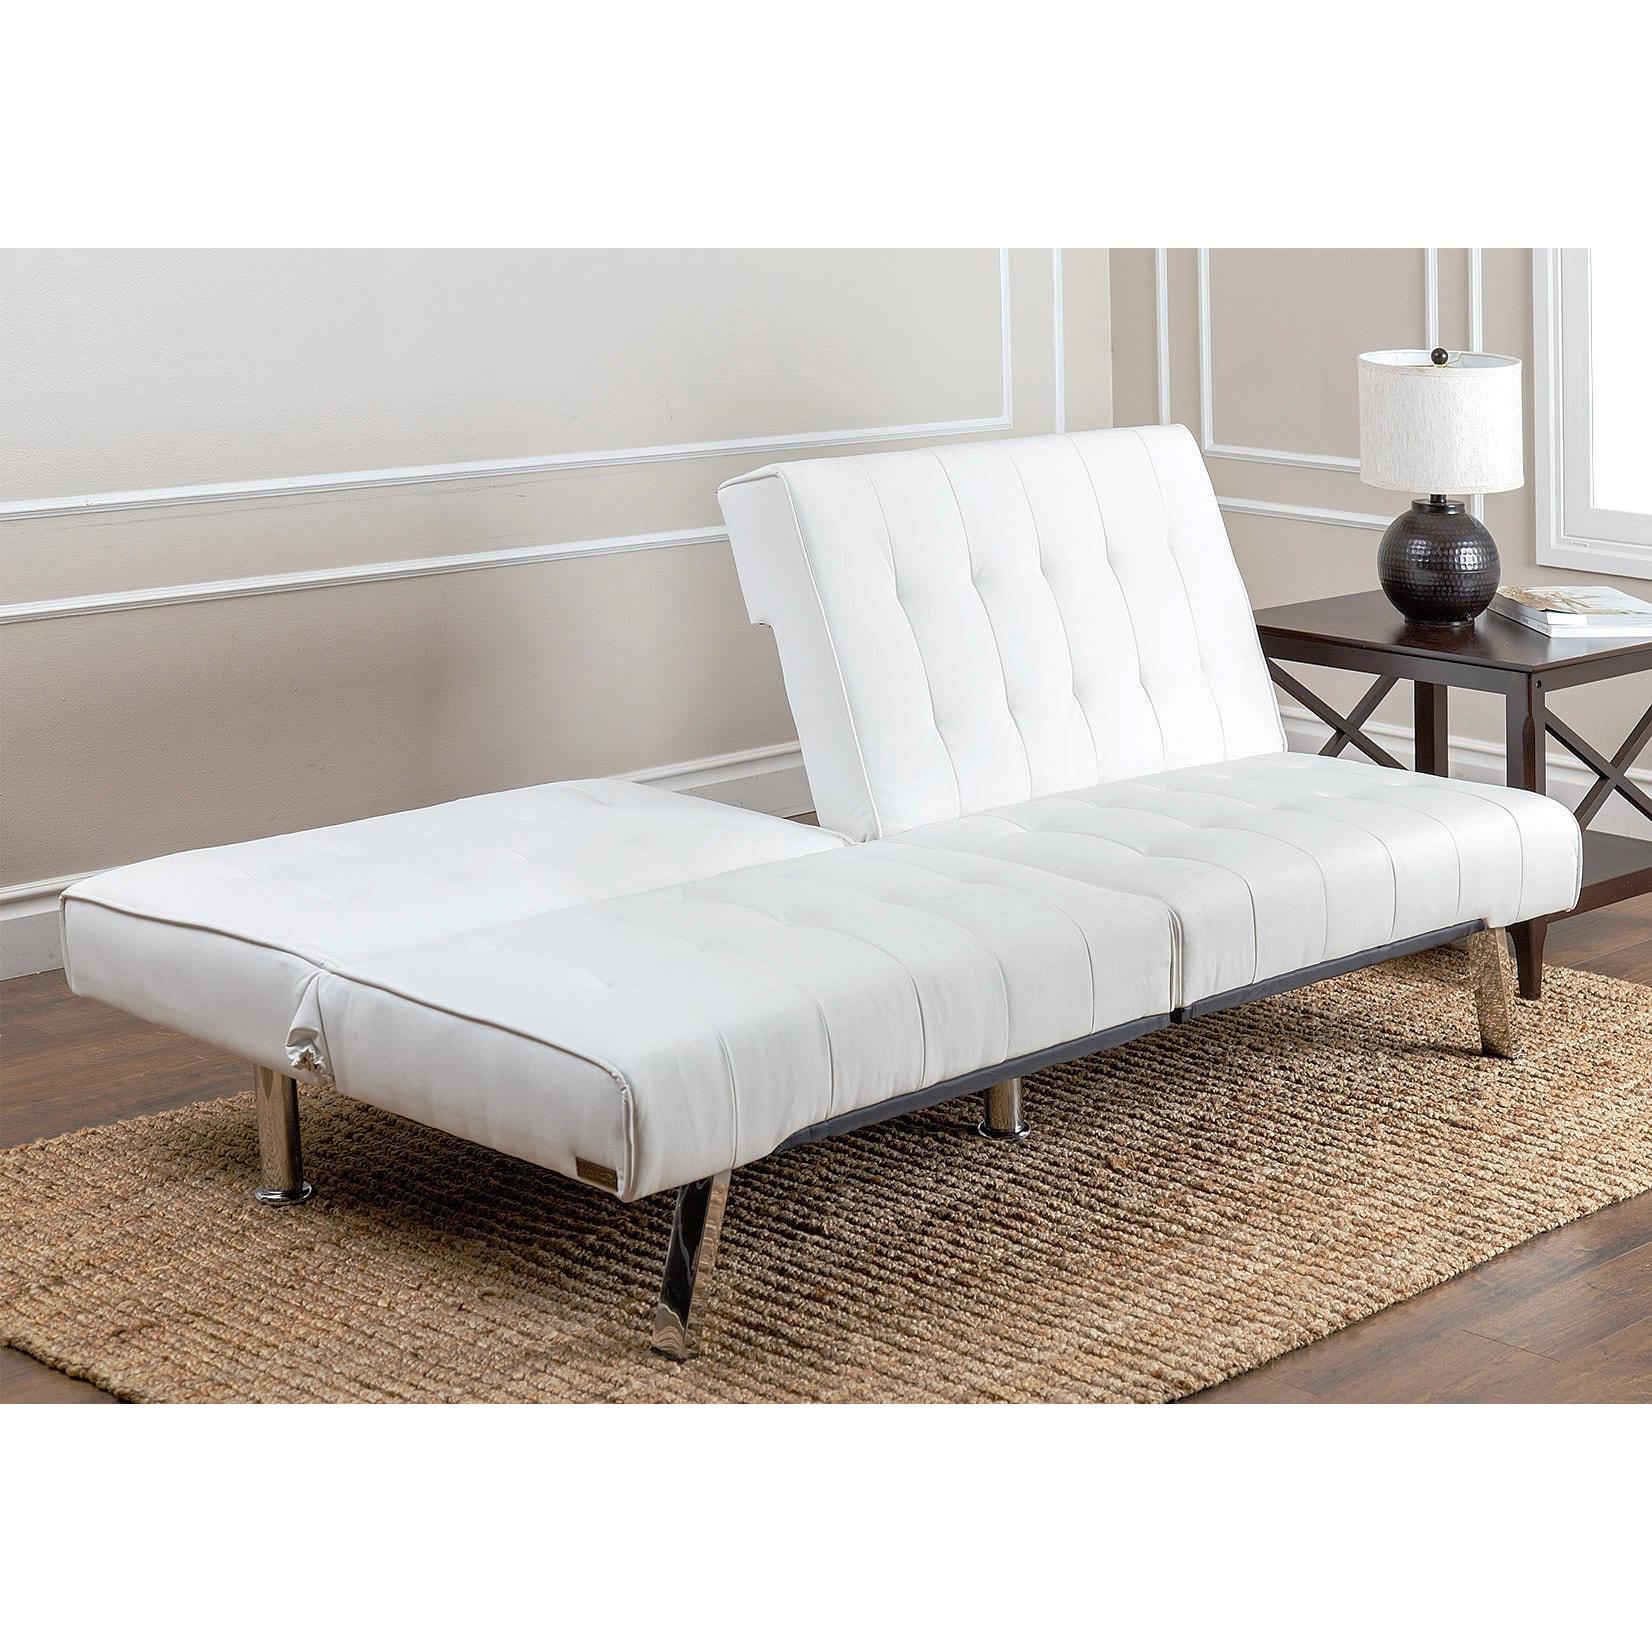 Abbyson Jackson Ivory Leather Foldable Futon Sofa Bed Free